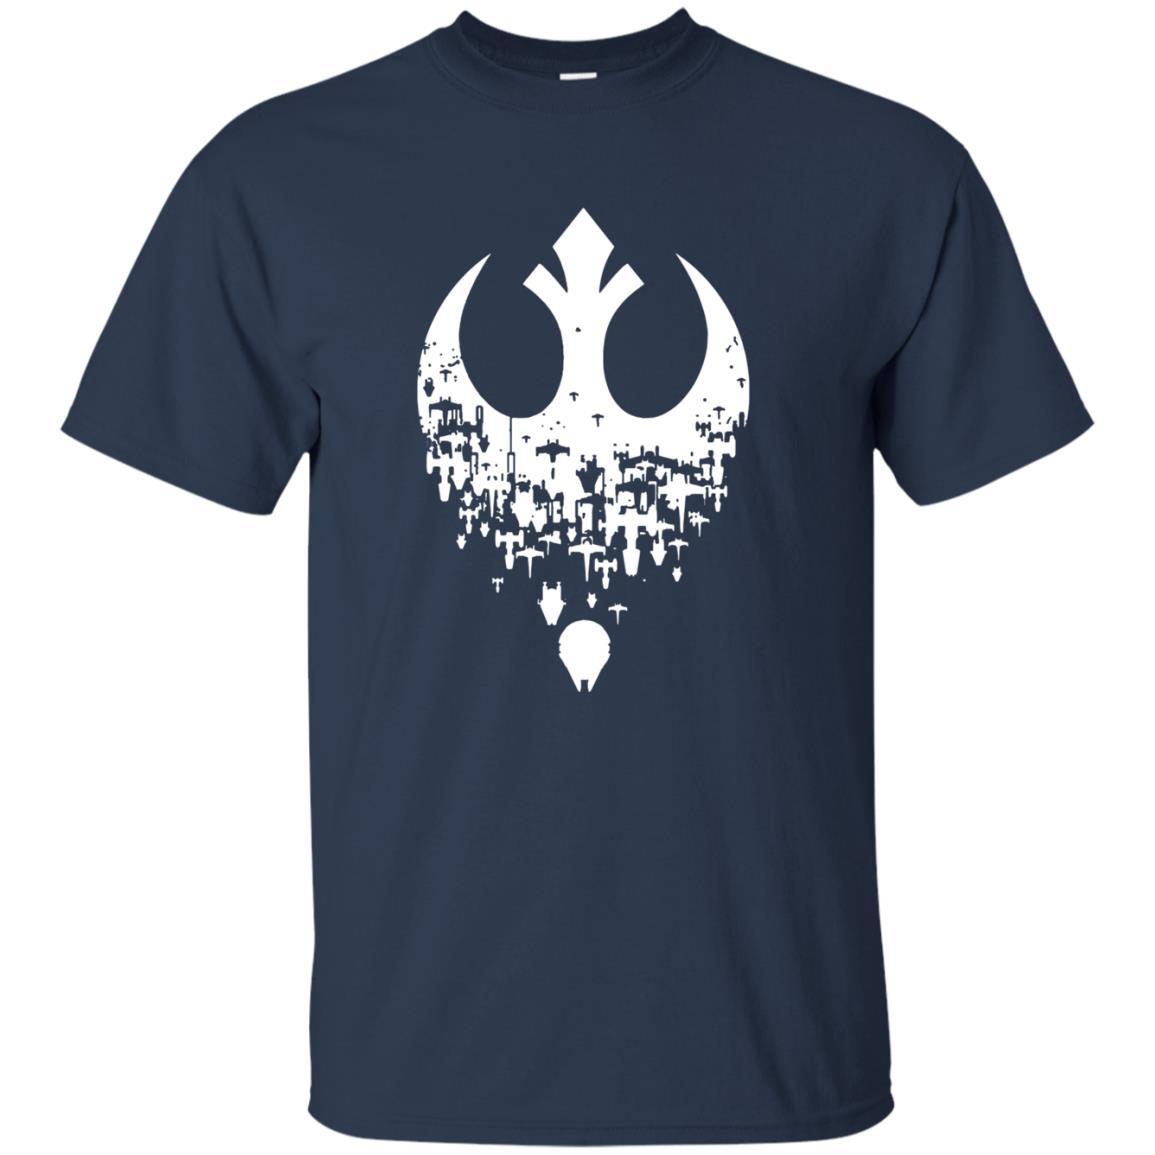 image 1500 - Star Wars Fractured Rebellion shirt, hoodie, tank